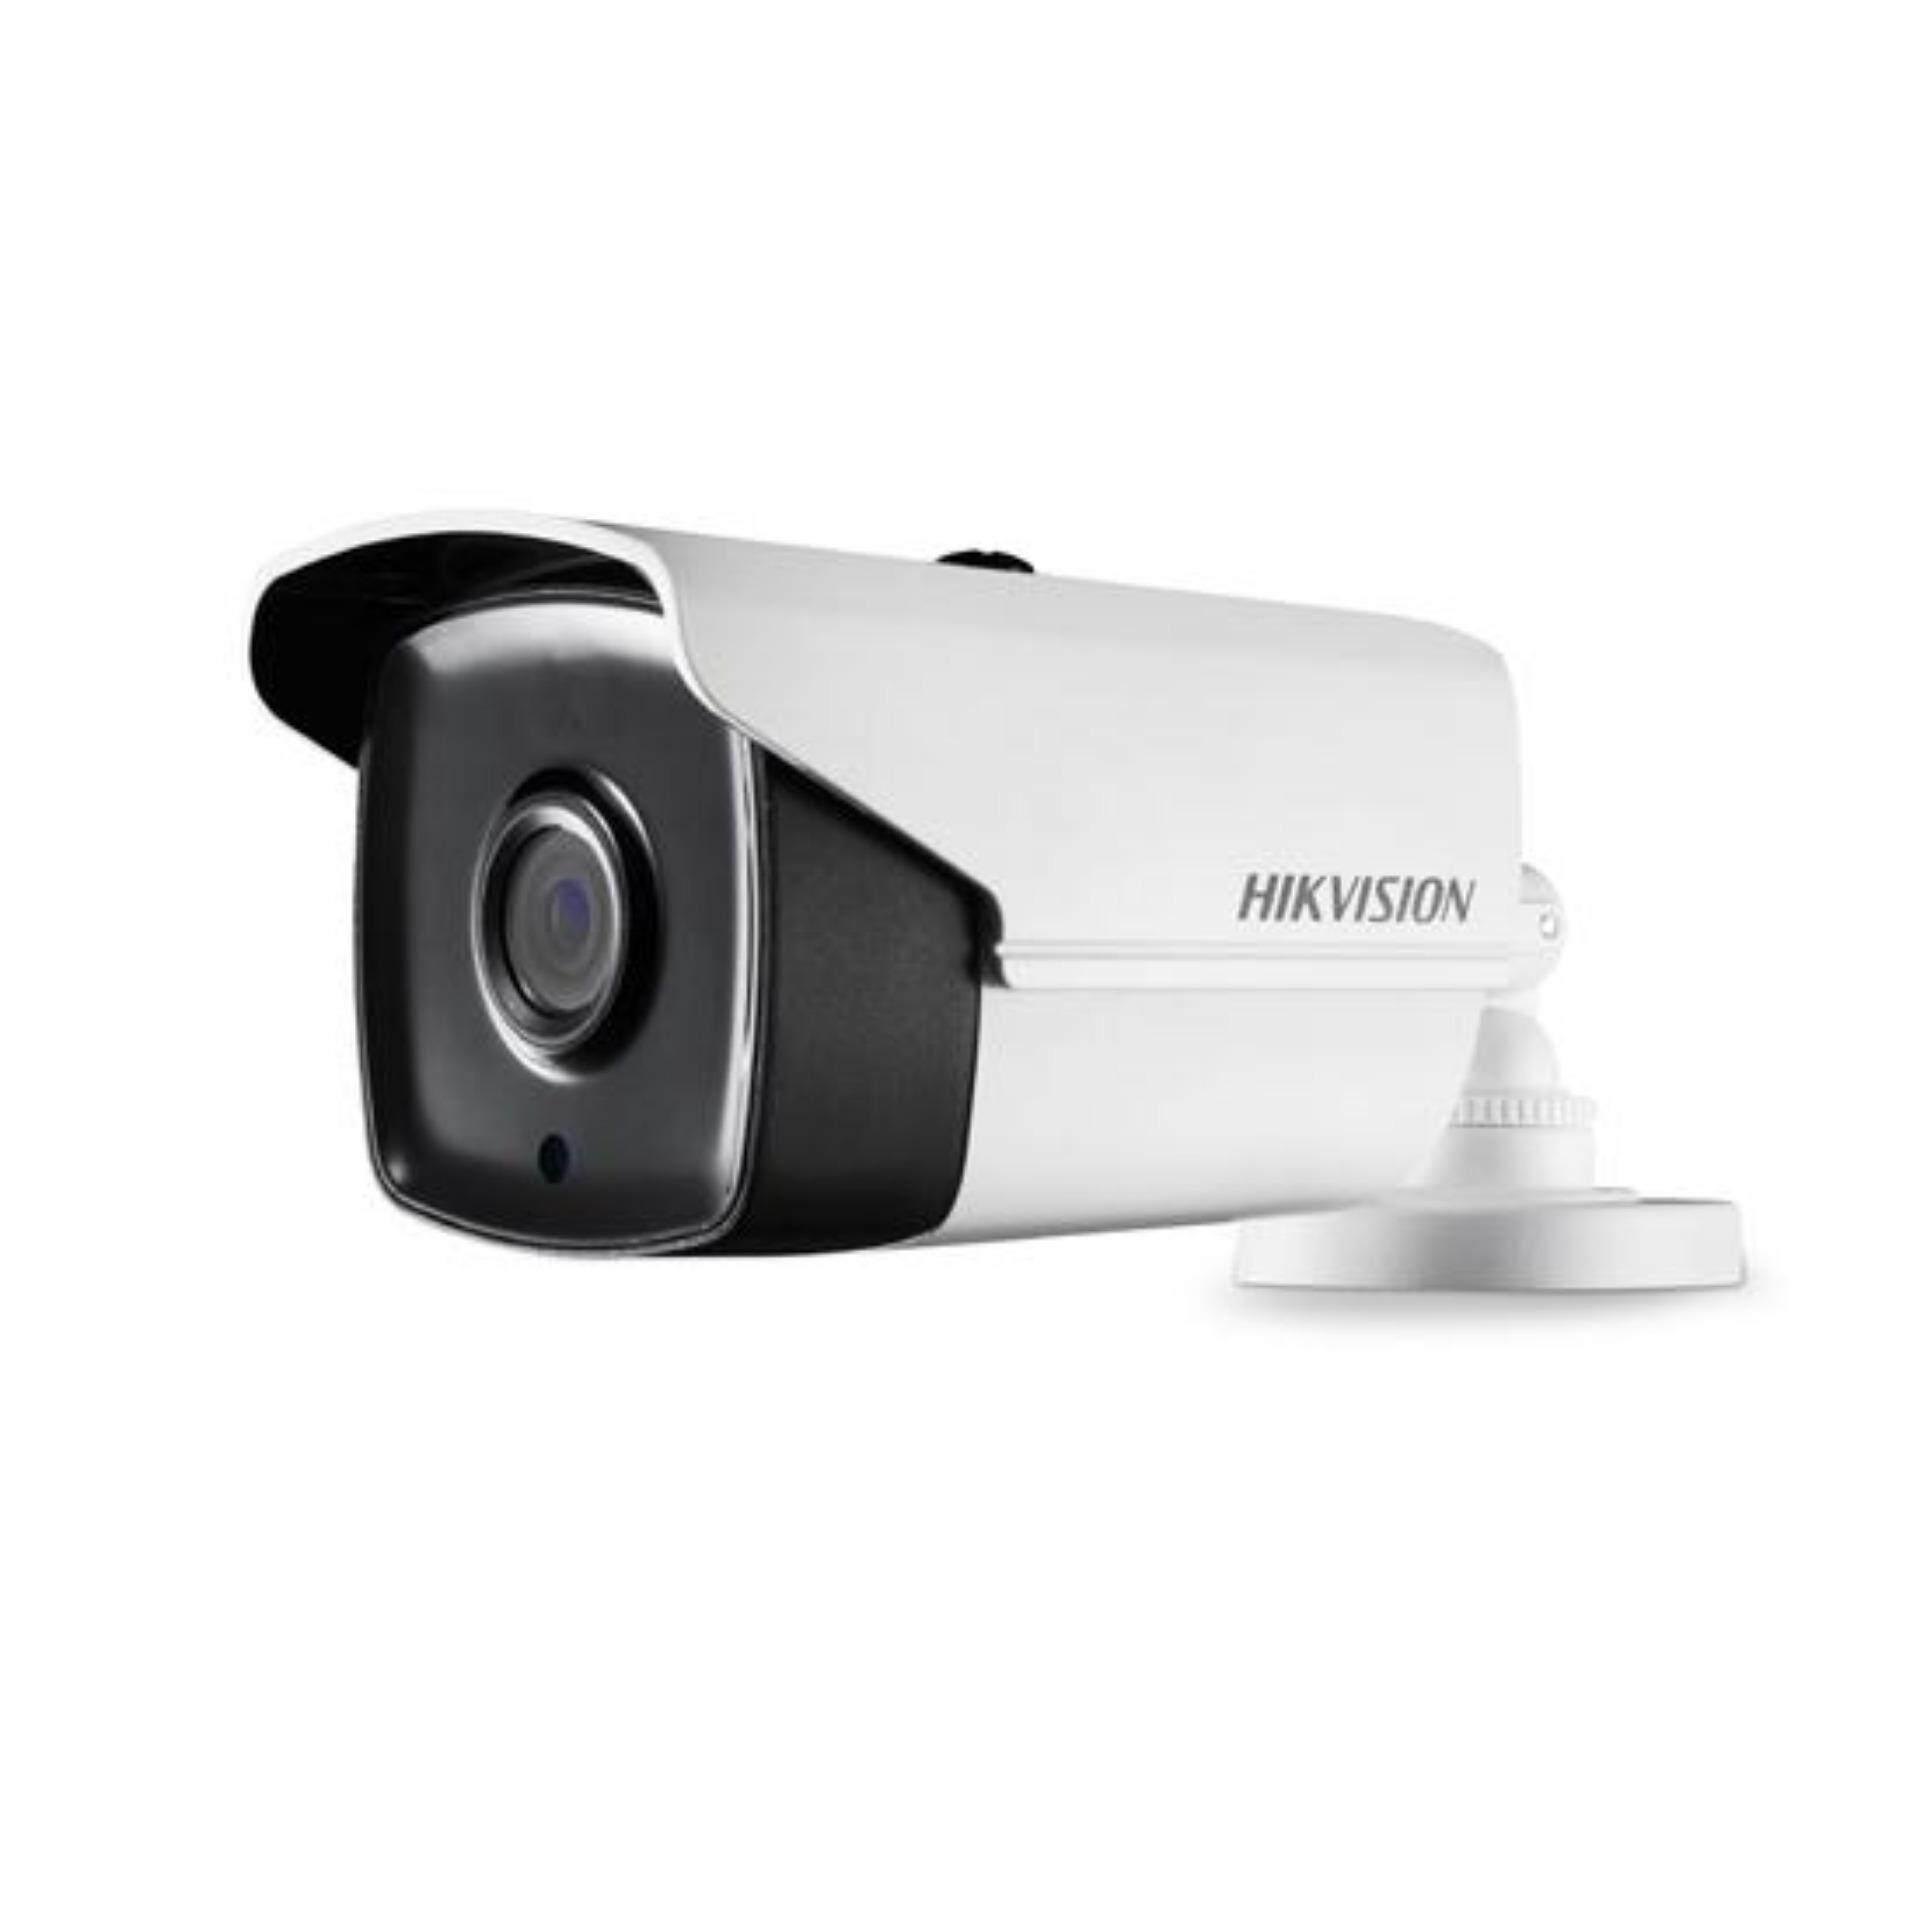 Hikvision HDTVI 1080P รุ่น DS-2CE16D7T-IT3 2MP ไม่สามารถใช้กับเครื่องบันทึกระบบ Analog ได้